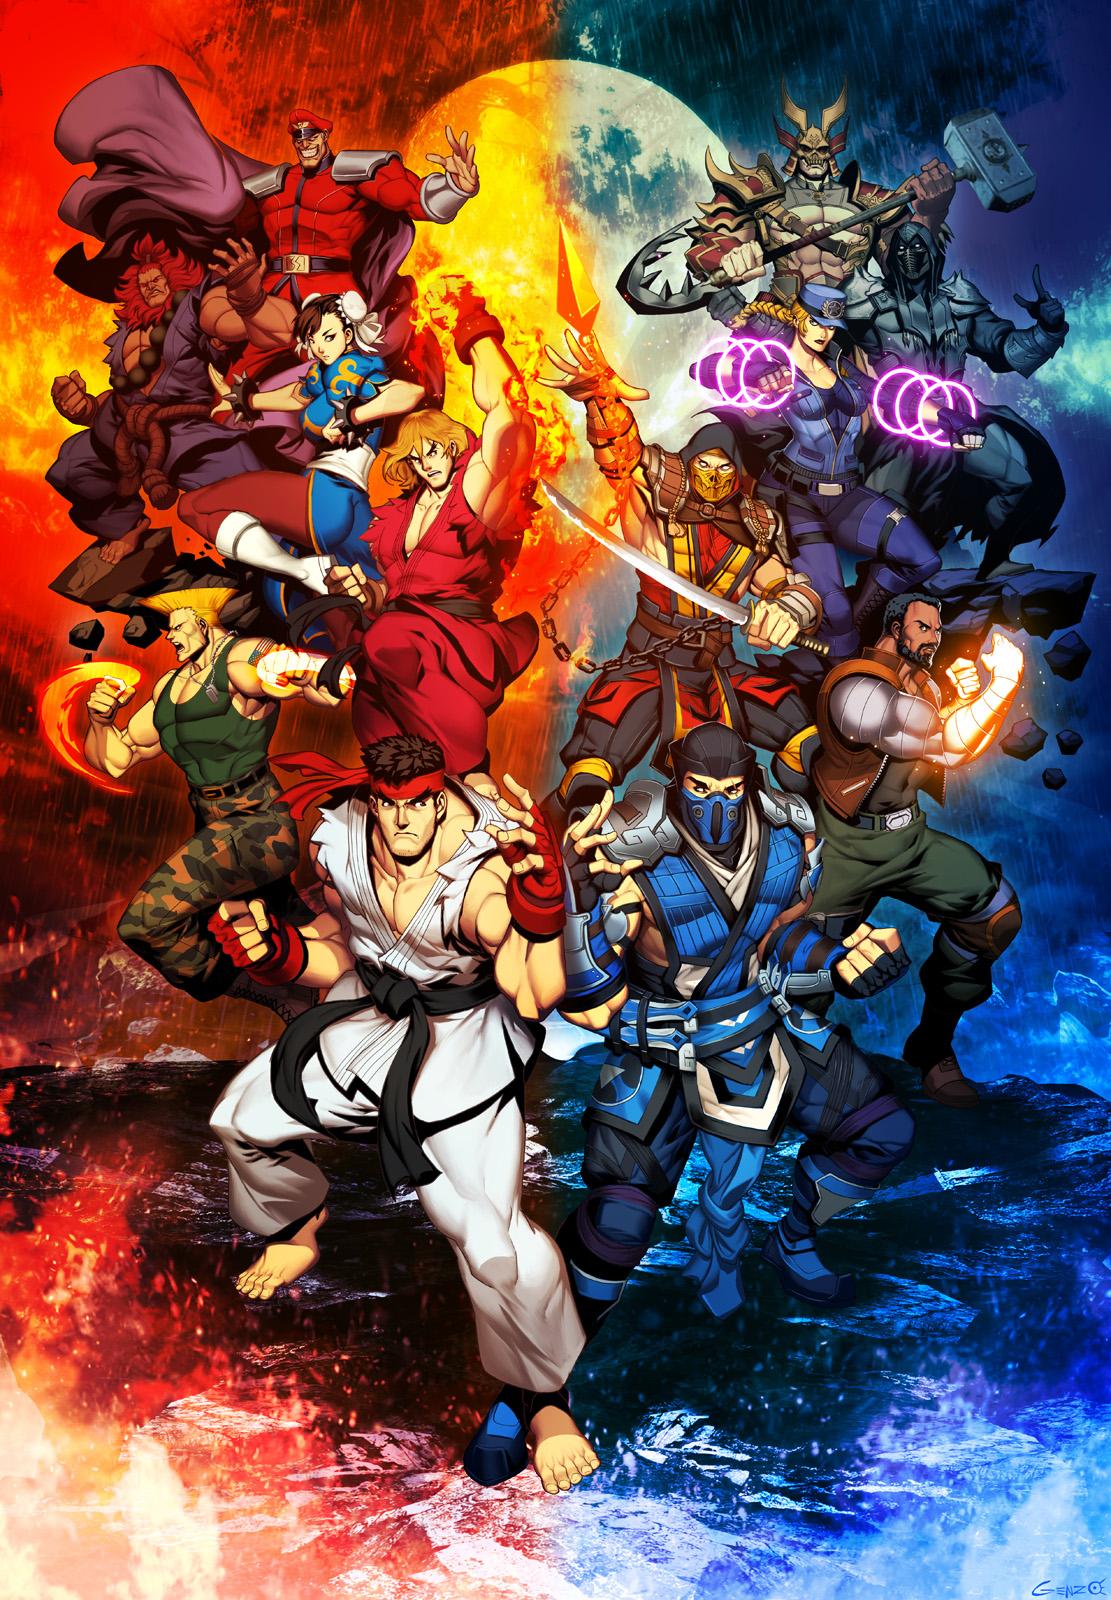 Street Fighter Vs Mortal Kombat By Genzoman On Deviantart